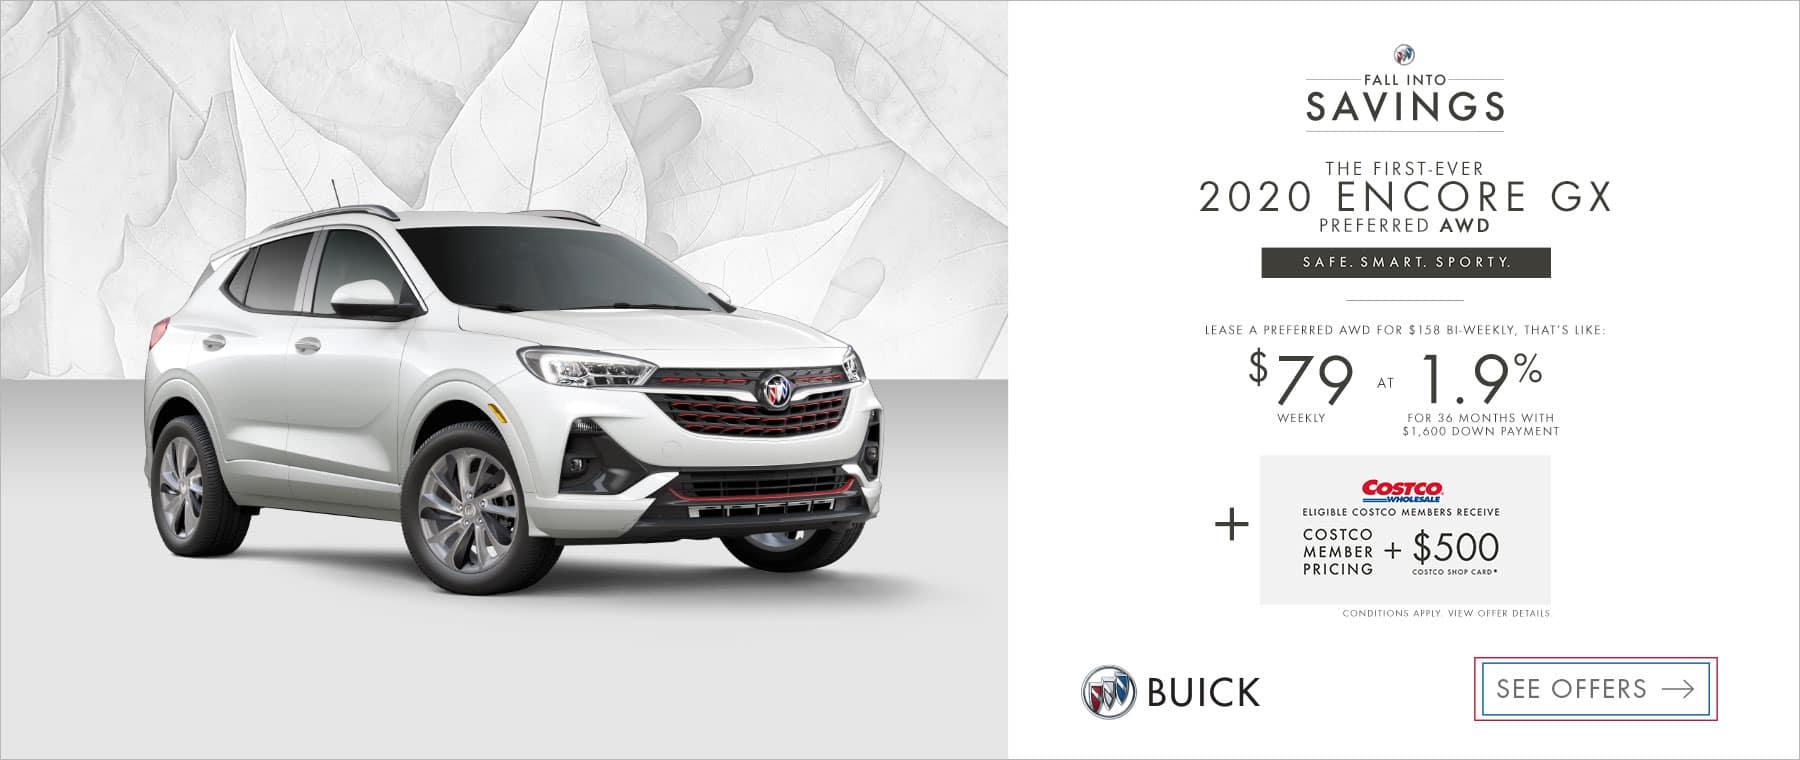 2020_CNT_Buick_ENCORE-GX_SEP_T3_EN_1800x760